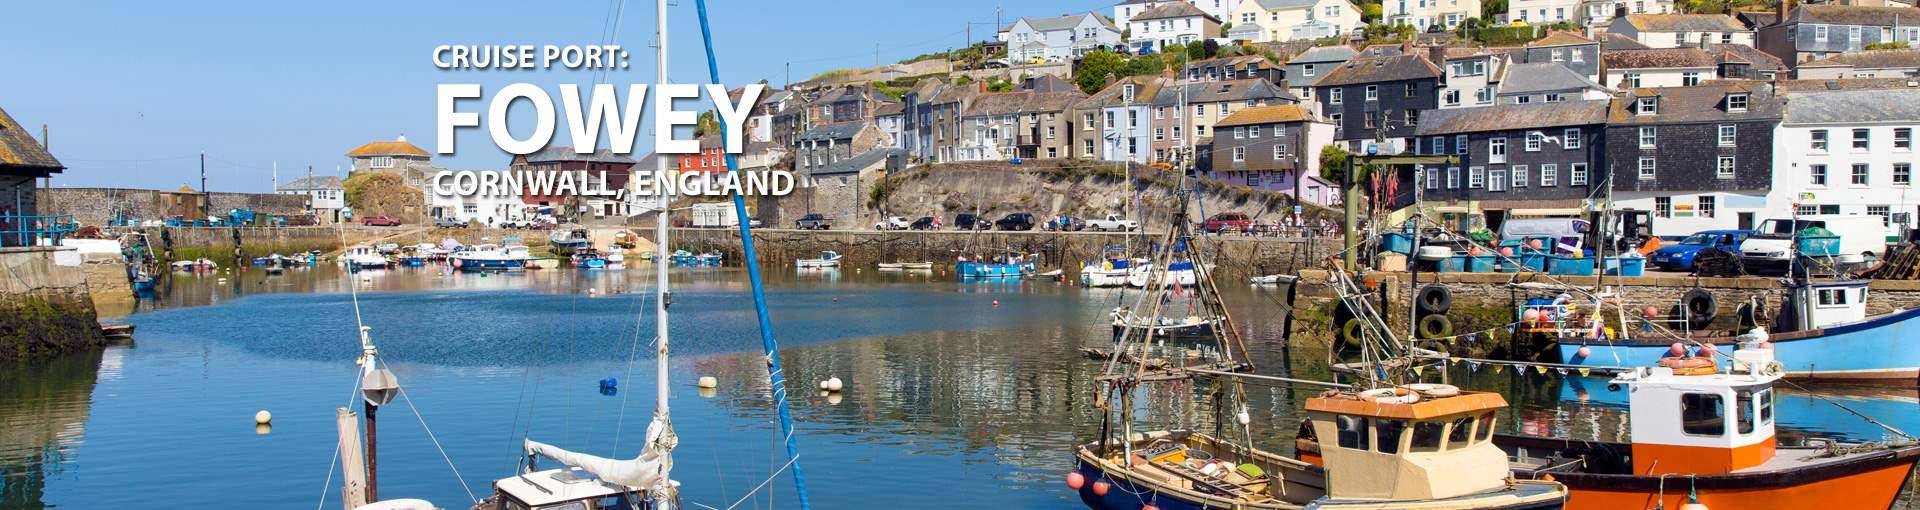 Cruises to Fowey, Cornwall, England